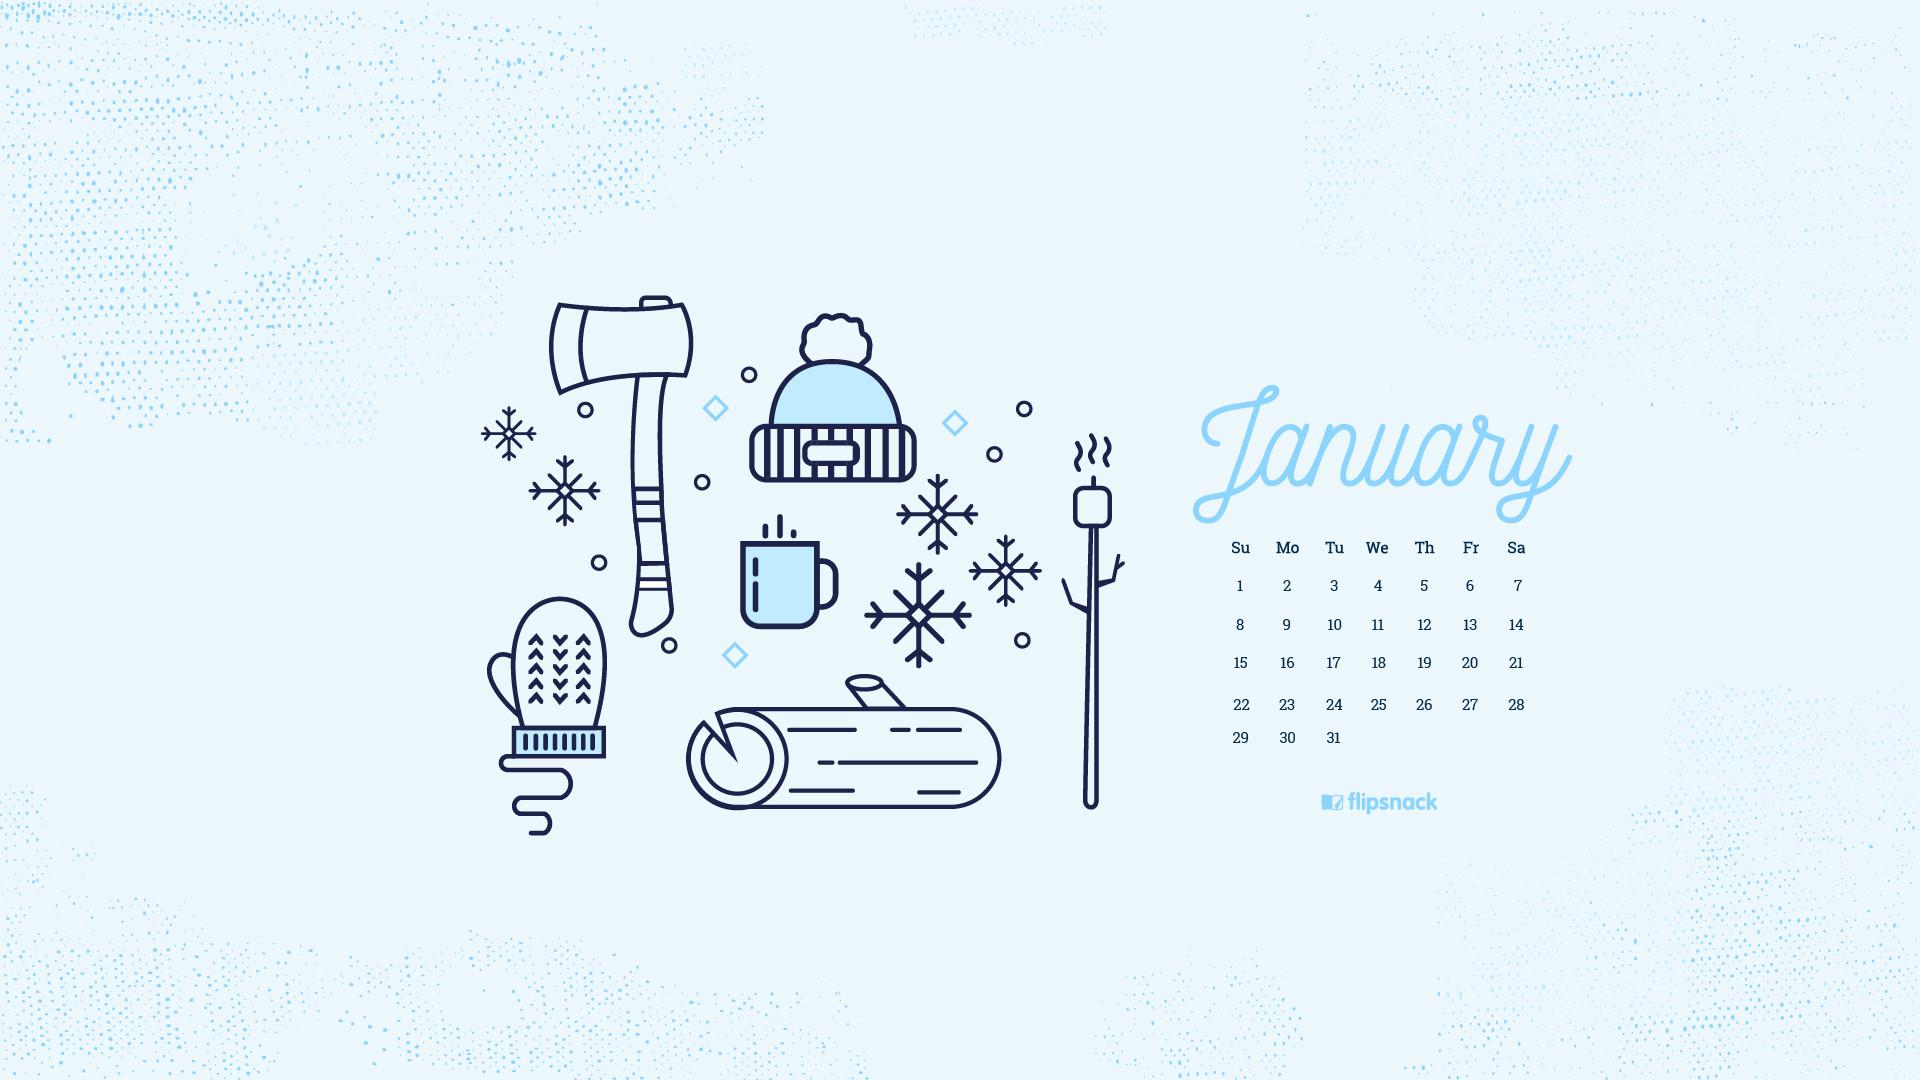 January 2018 Desktop Wallpaper 61 images 1920x1080